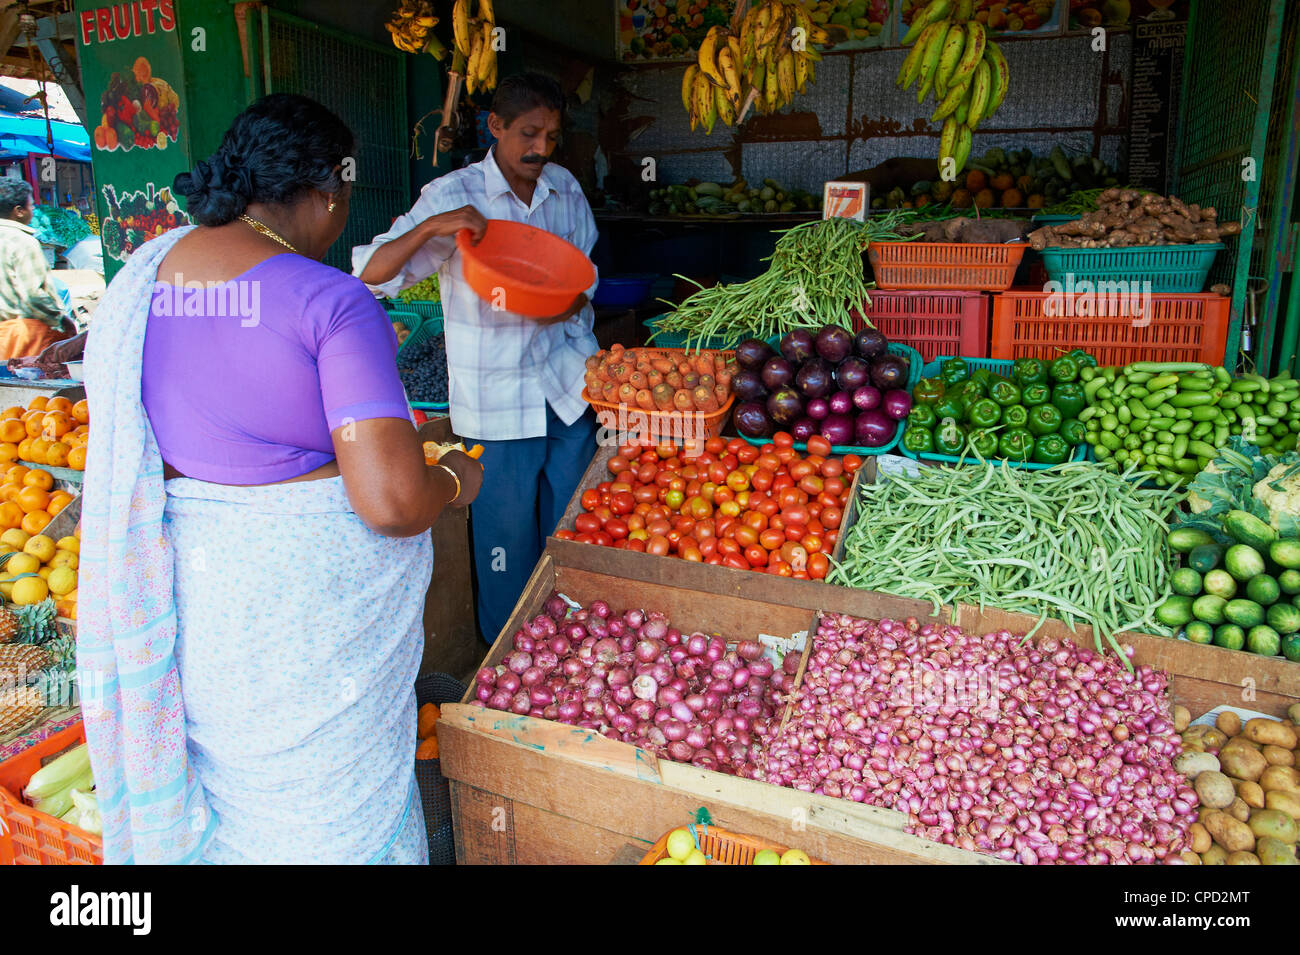 Obstmarkt, Trivandrum (Thiruvananthapuram), Kerala, Indien, Asien Stockbild